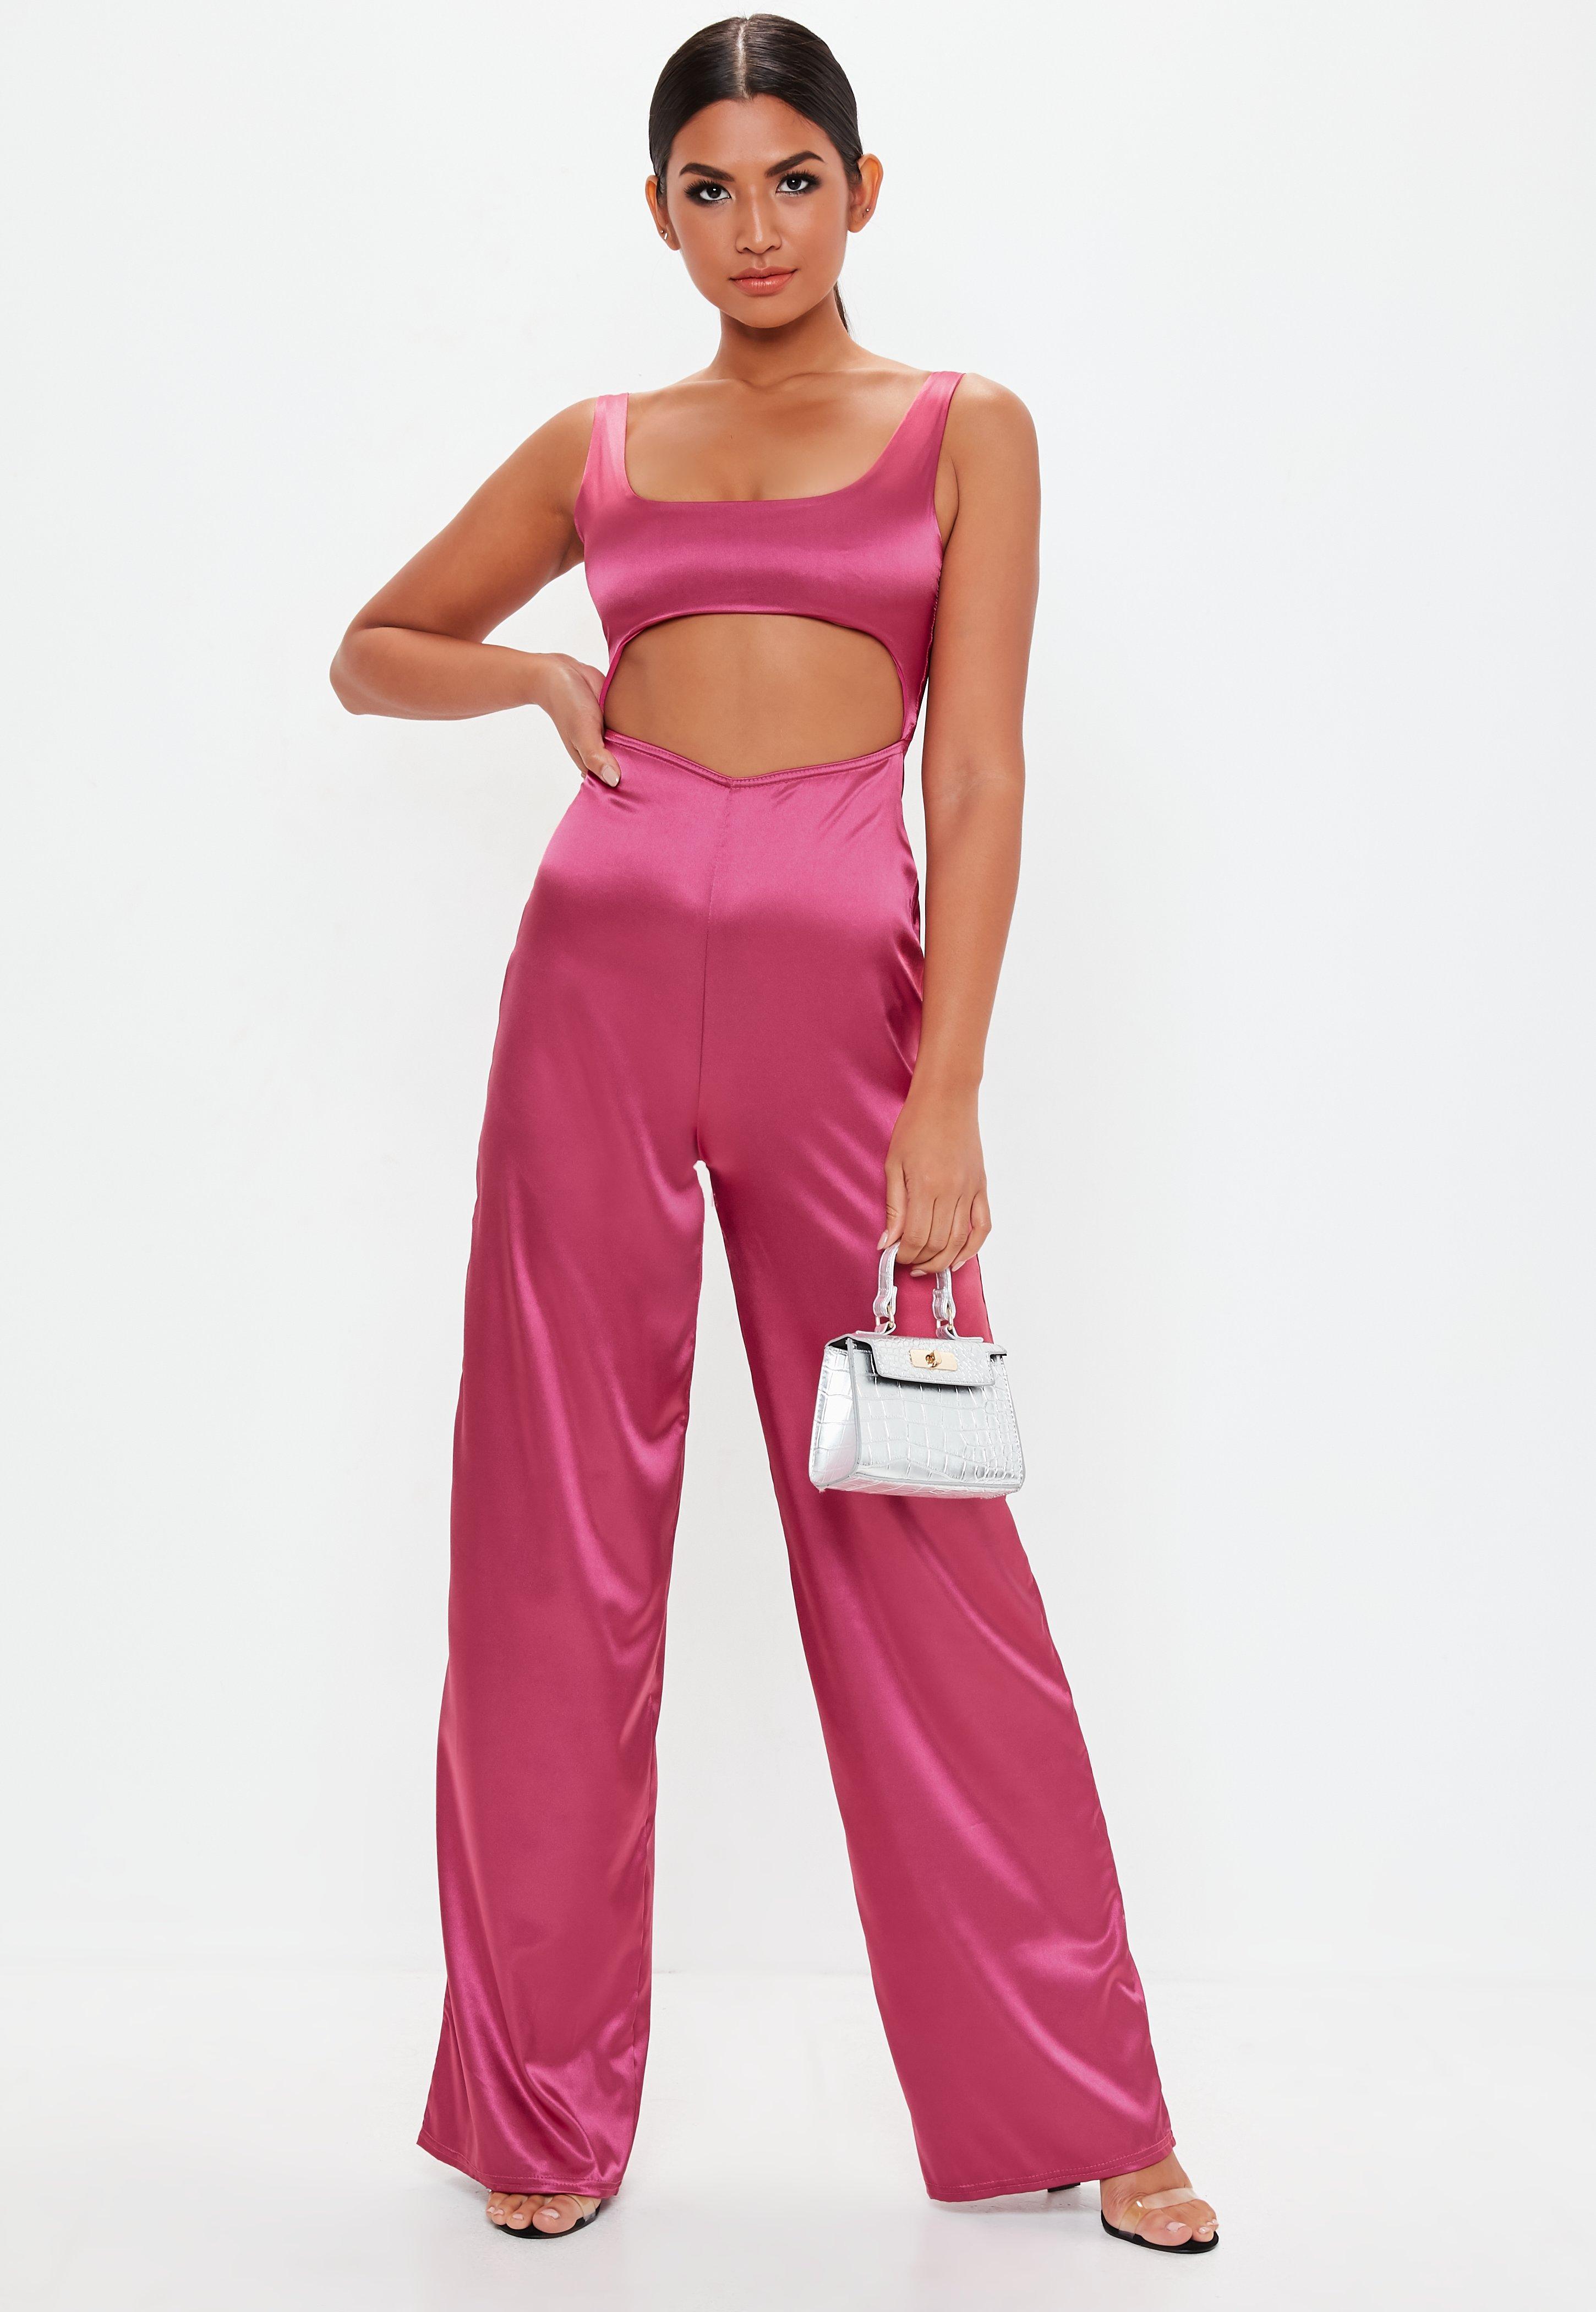 0cf0b61bfba8 Pink Cut Out Satin Jumpsuit